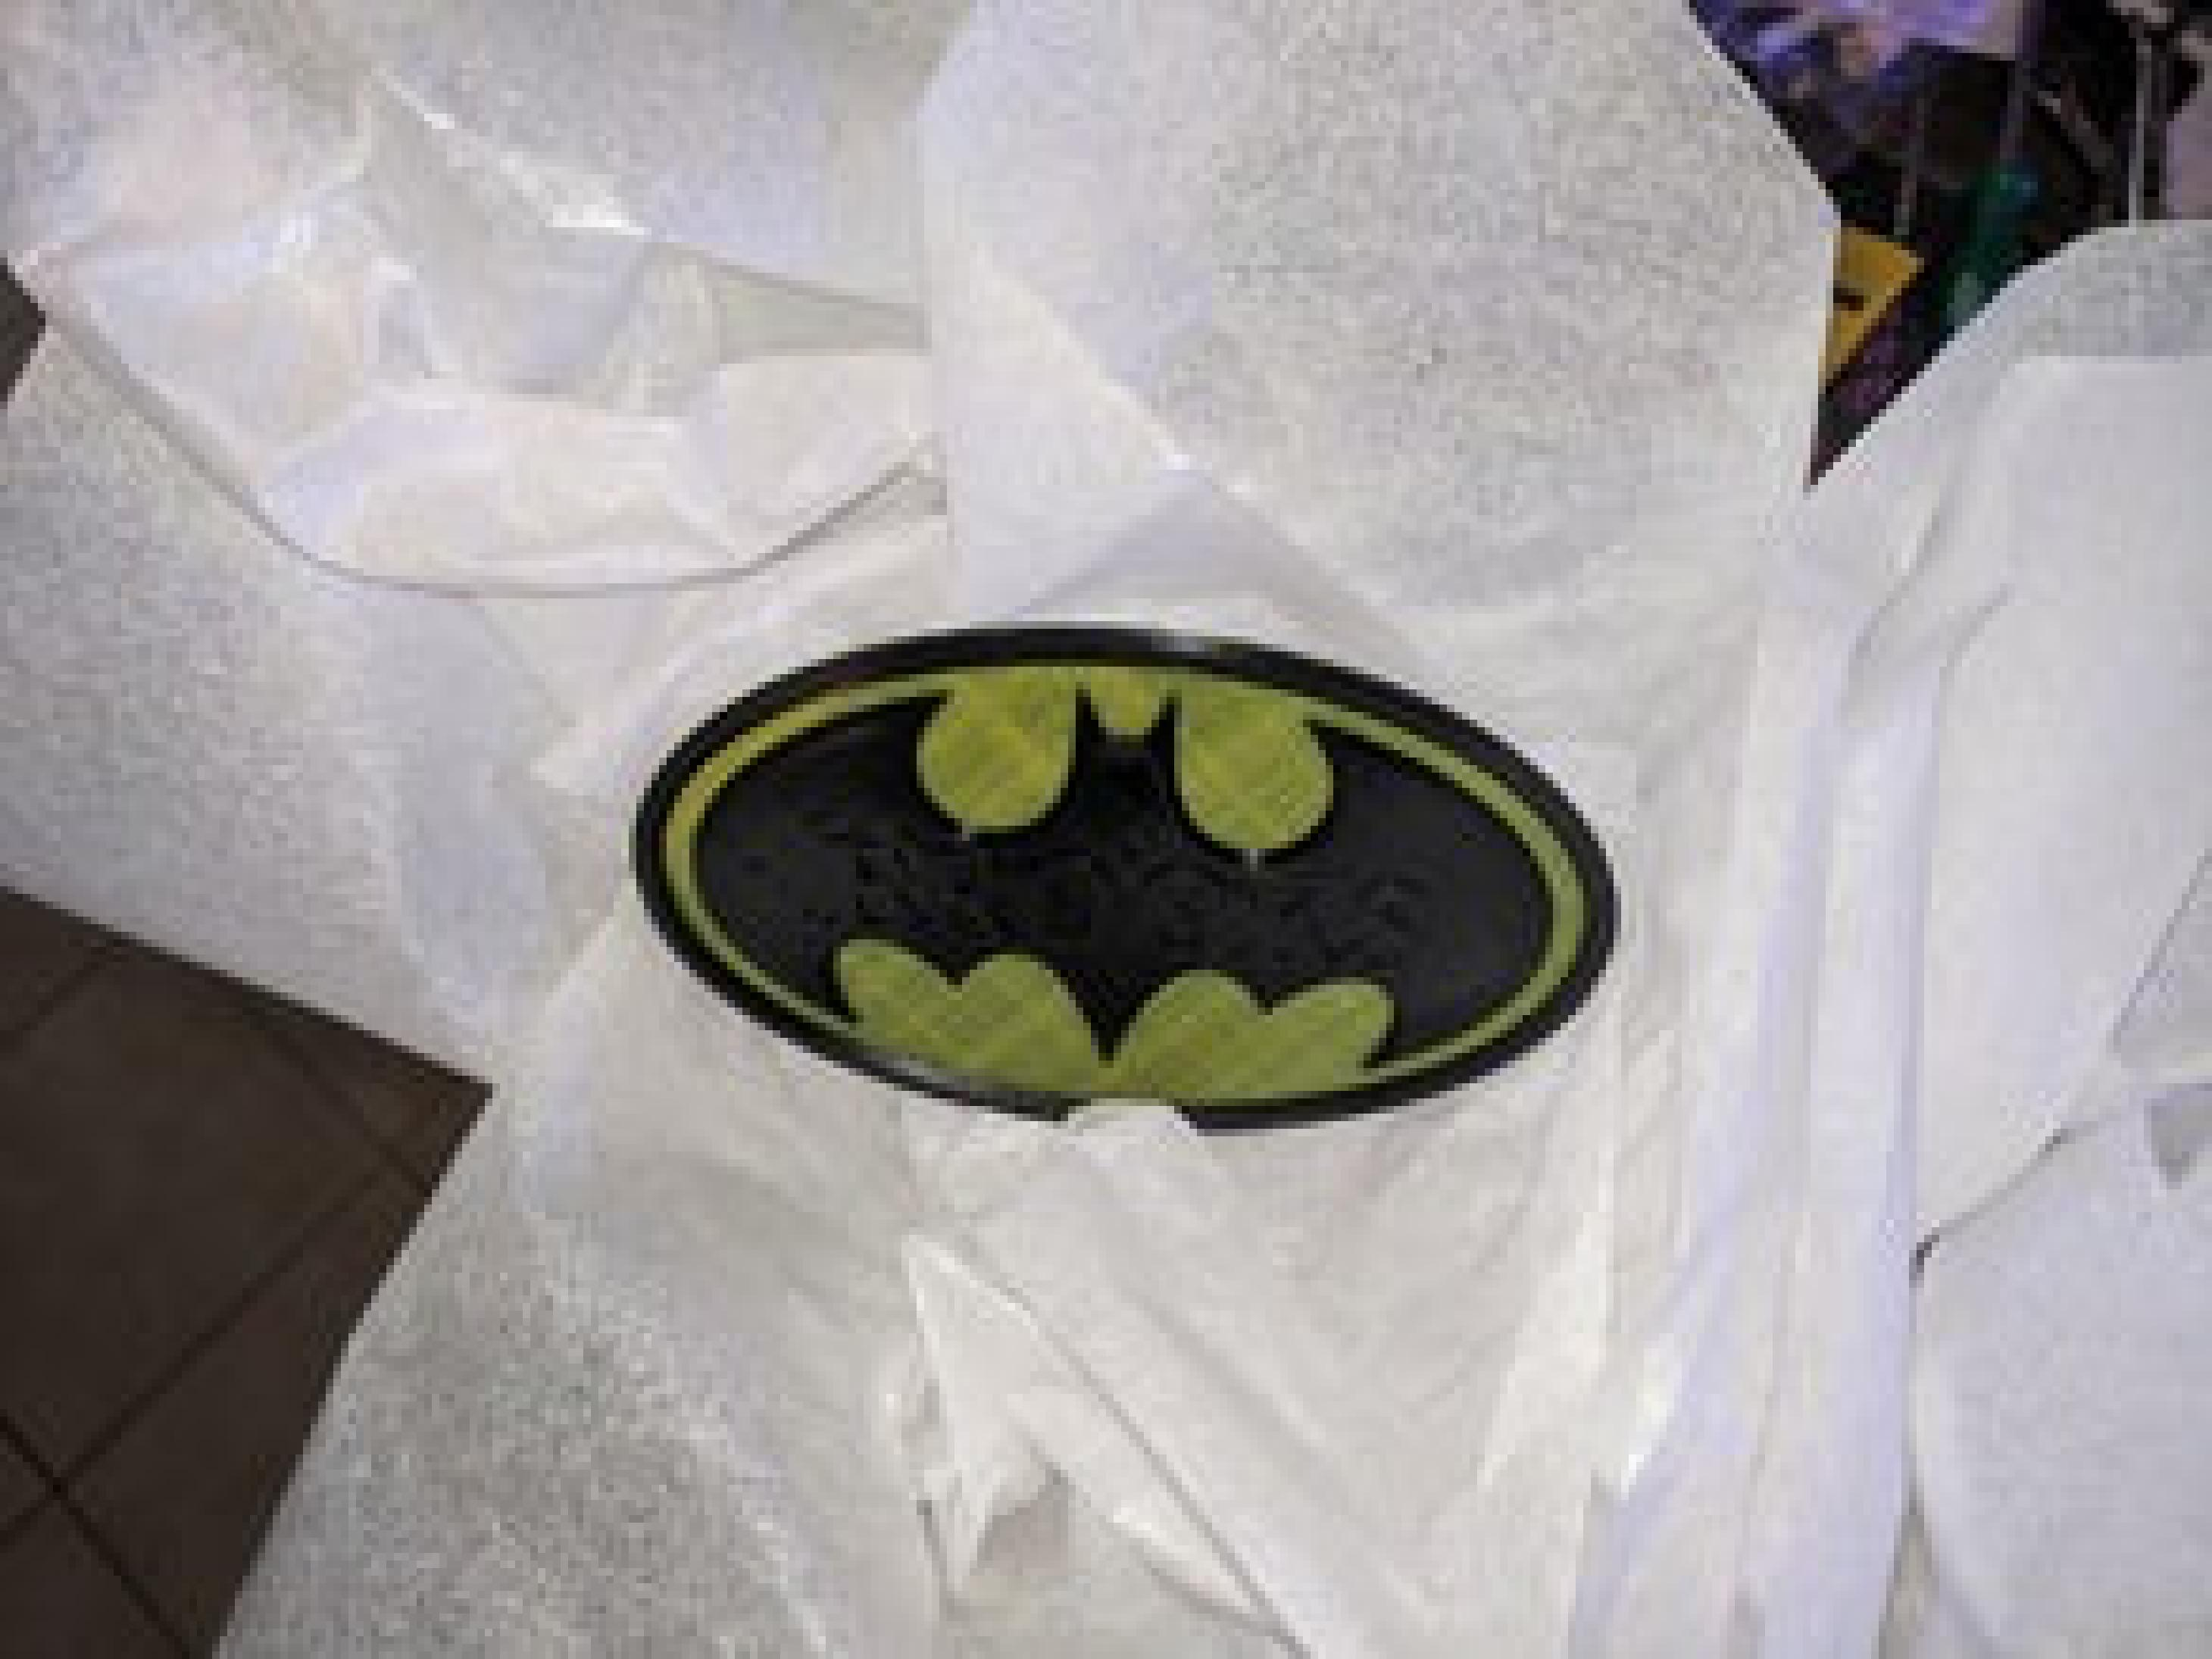 1989 Batman Amblemi Dekoratif Biblo Dekor Hediyelik Süs Eşyası